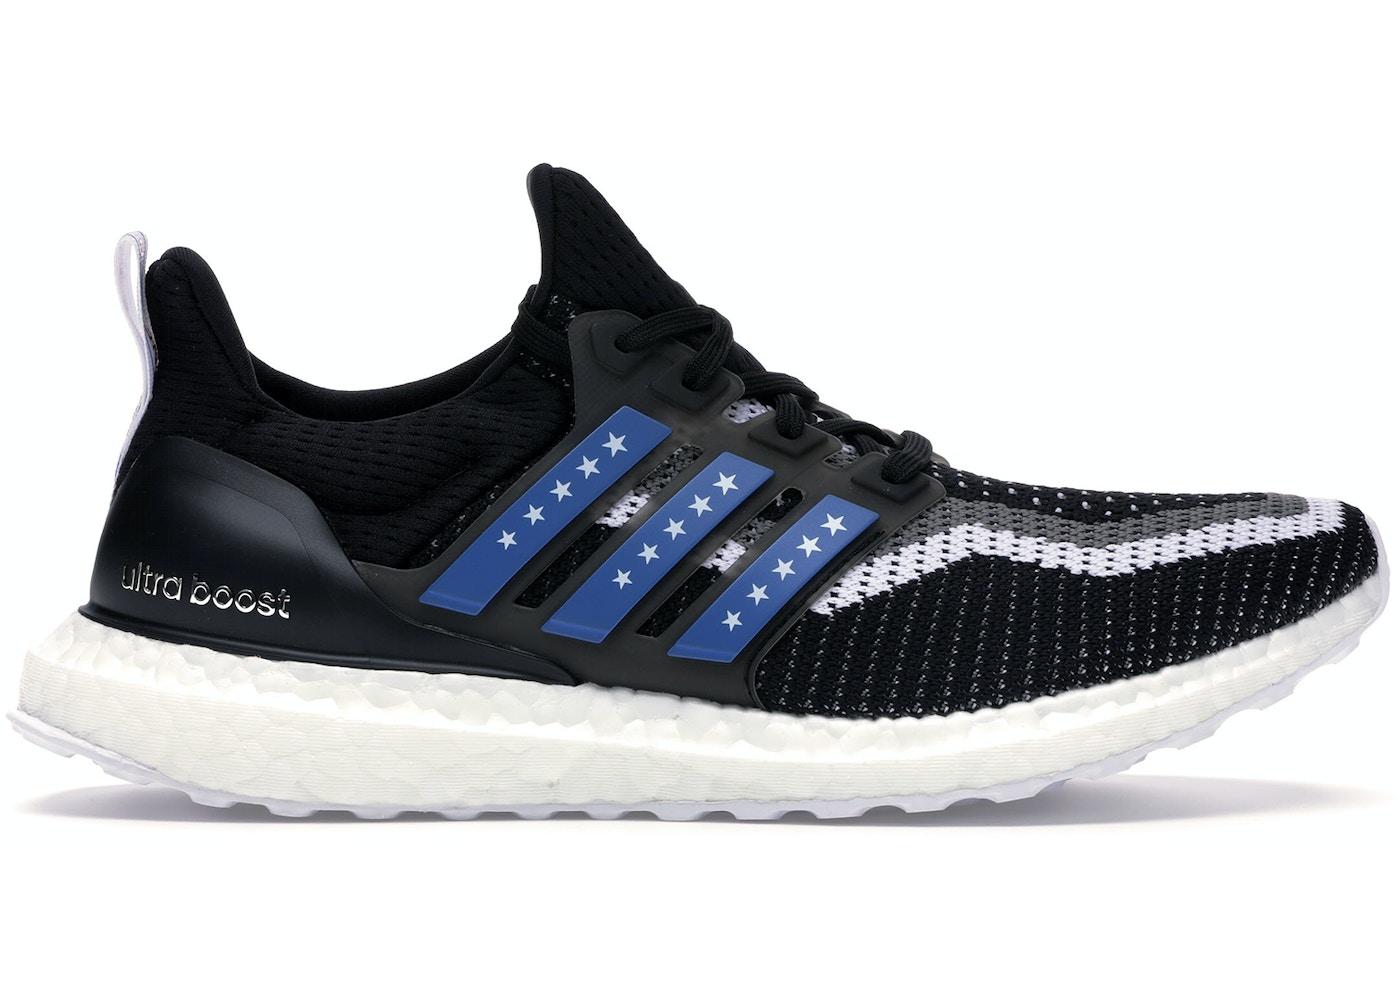 wholesale dealer b830d 87ea8 Buy adidas Ultra Boost Shoes & Deadstock Sneakers